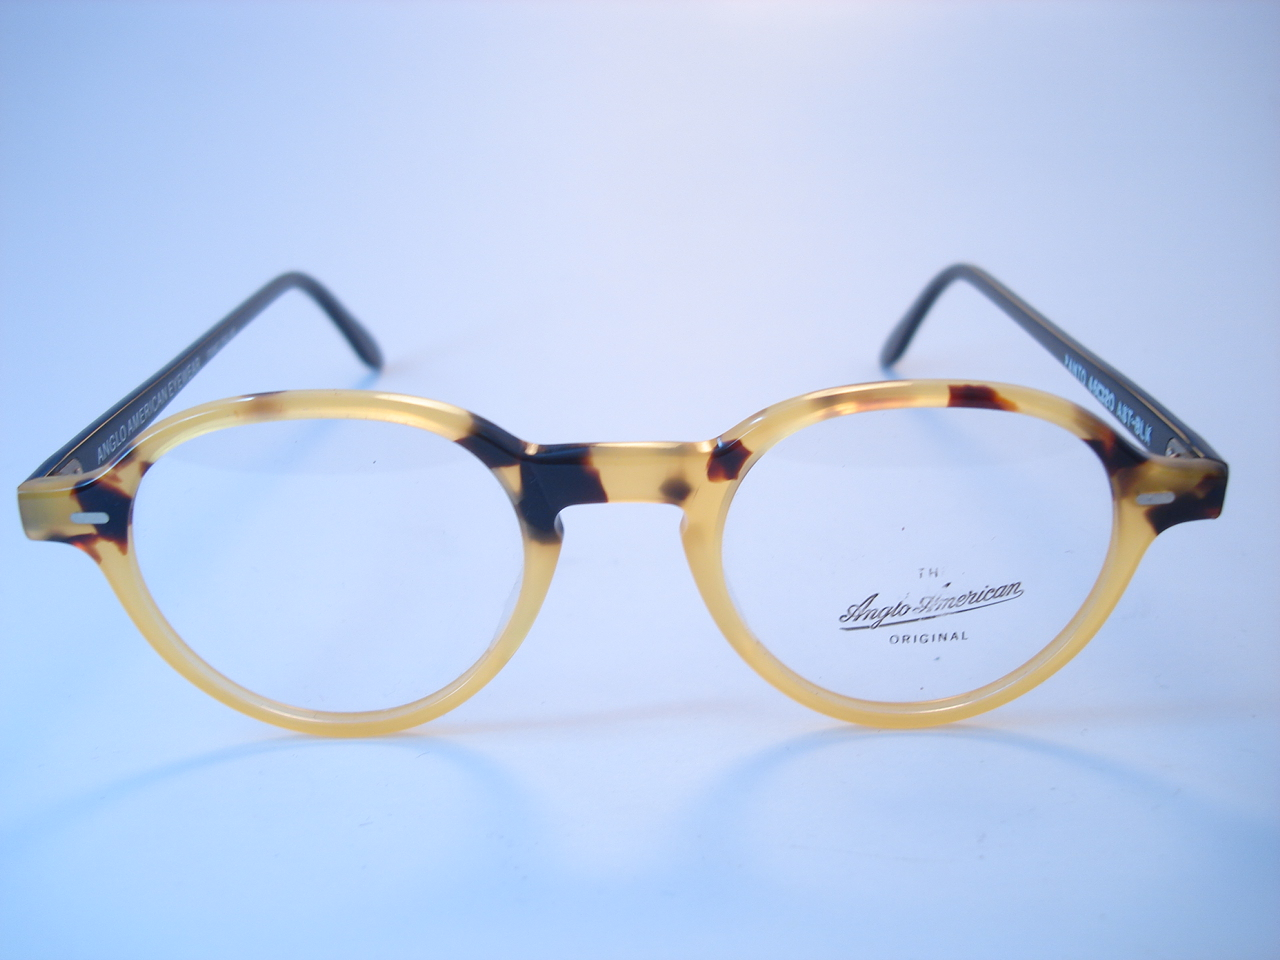 theothersideofthepillow vintage anglo american eyewear